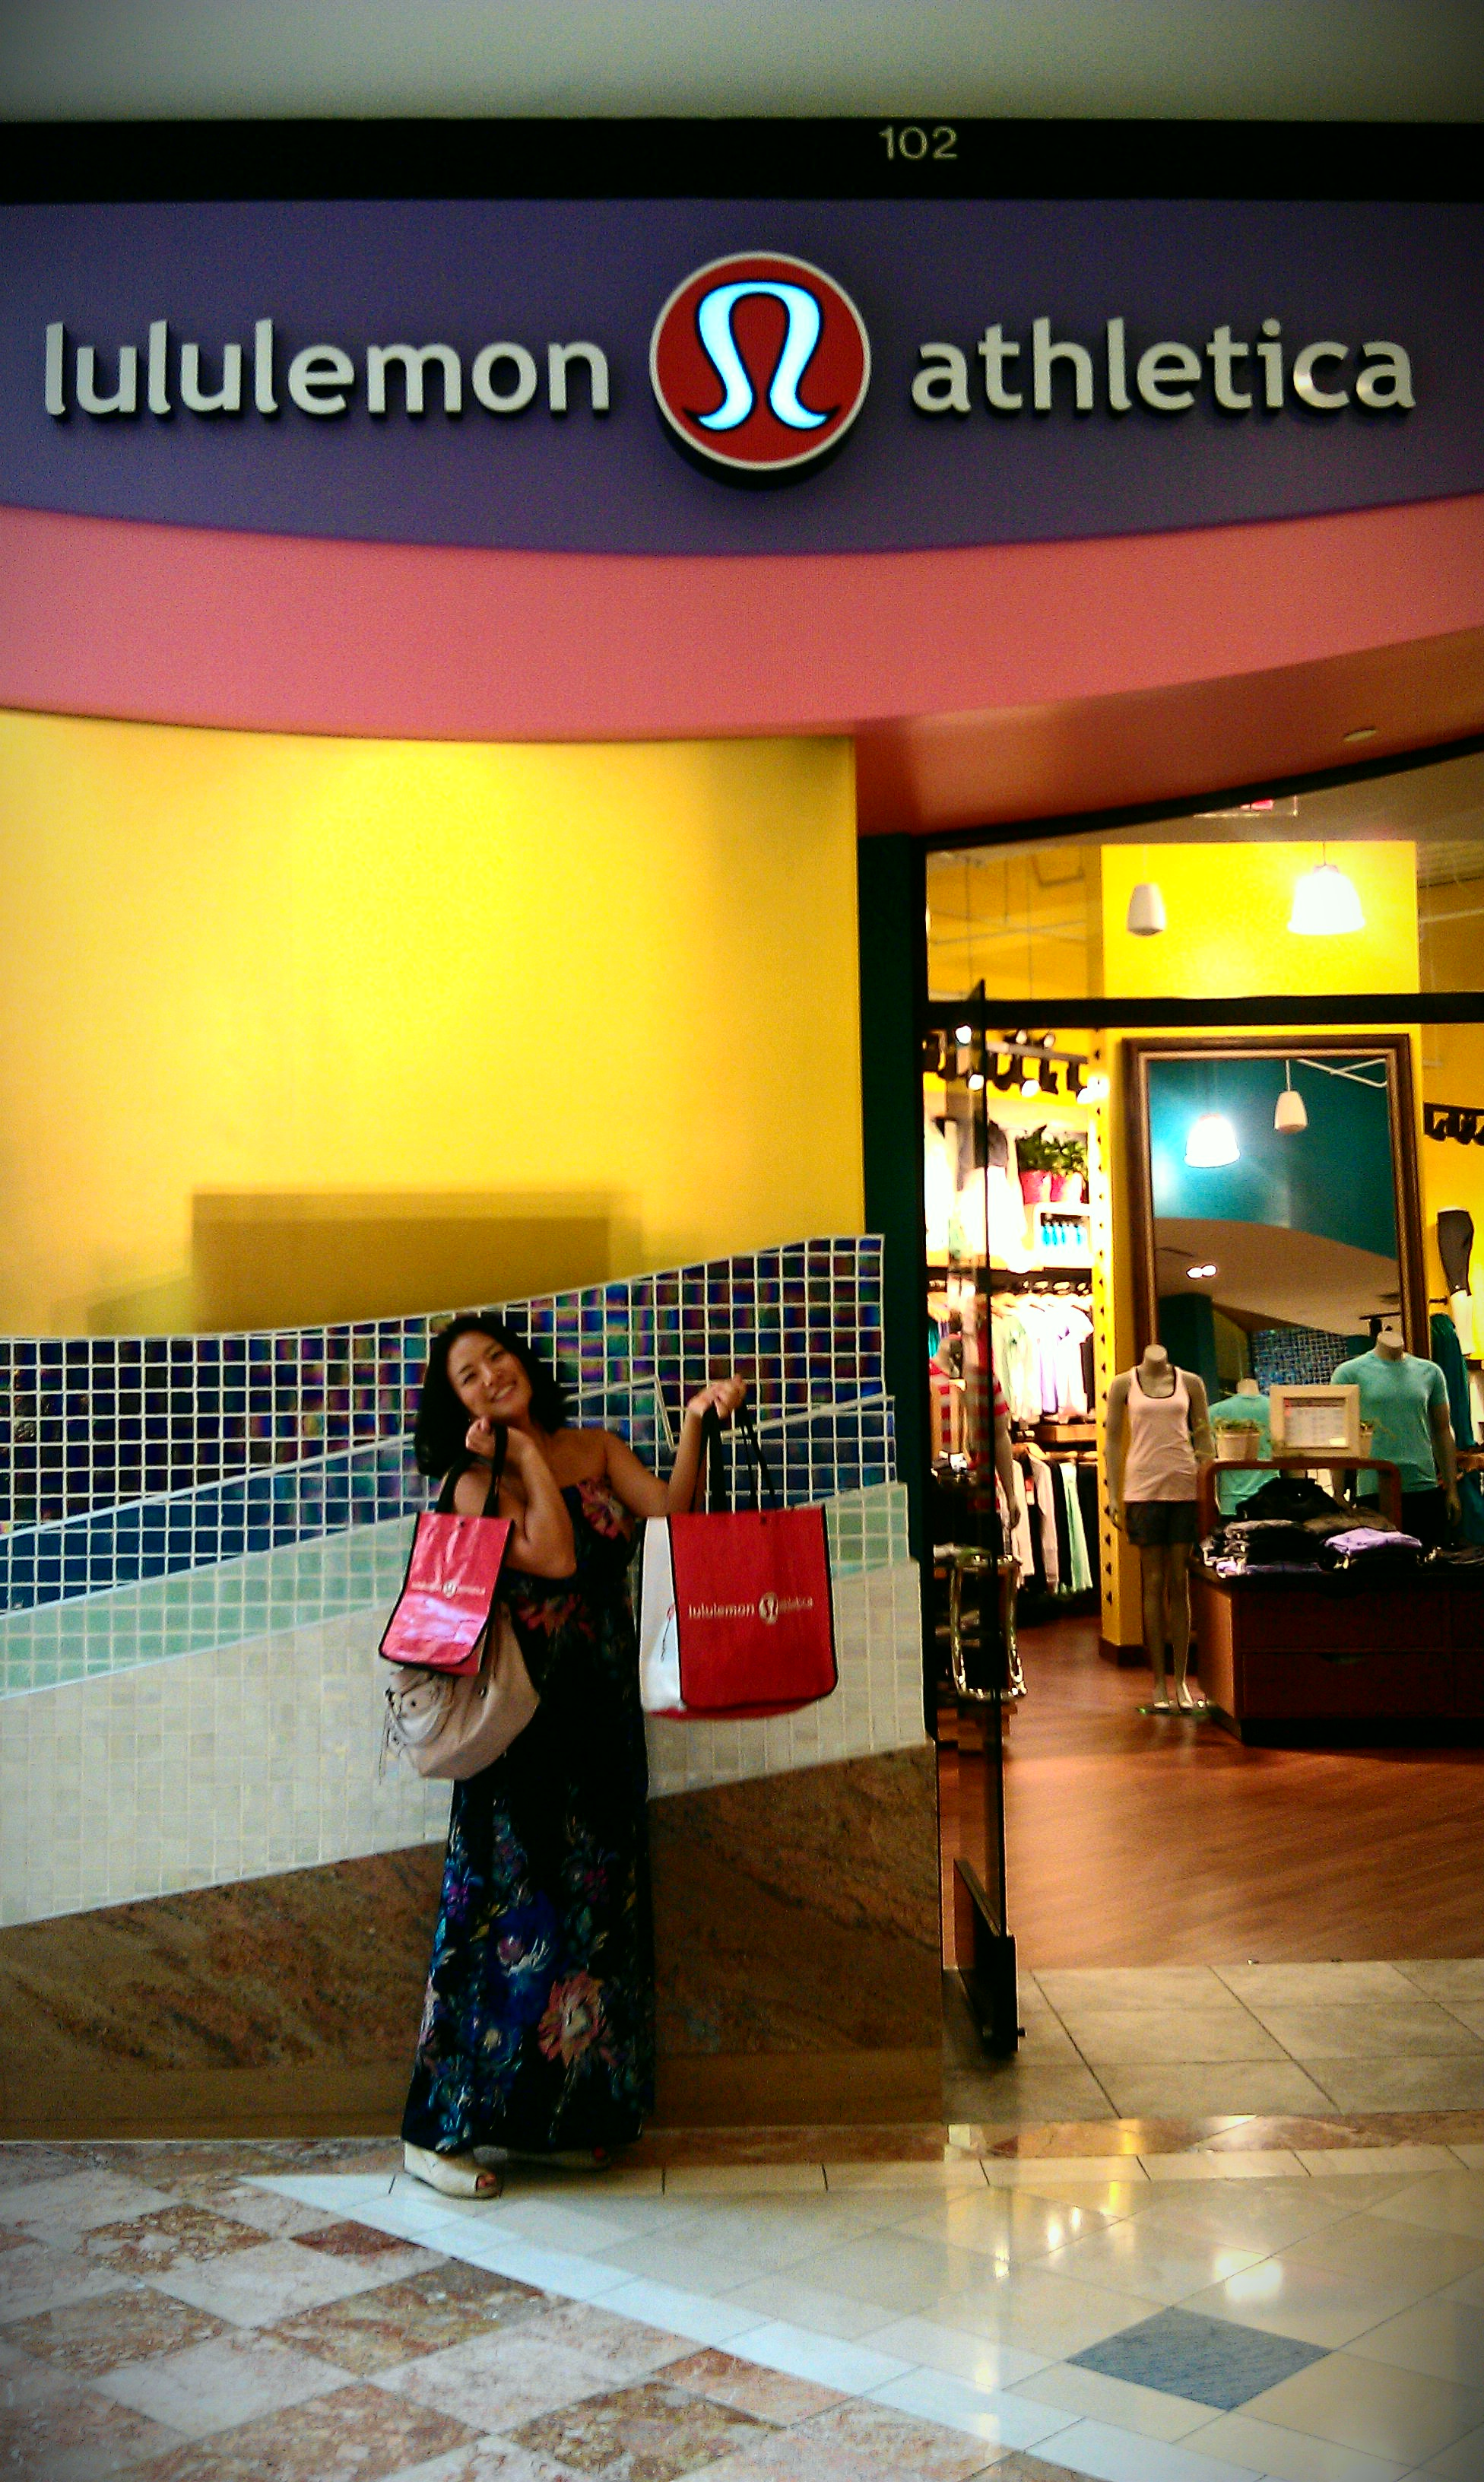 Southcoast Mall - http://www.lululemon.com/costamesa/costamesa?sli=1